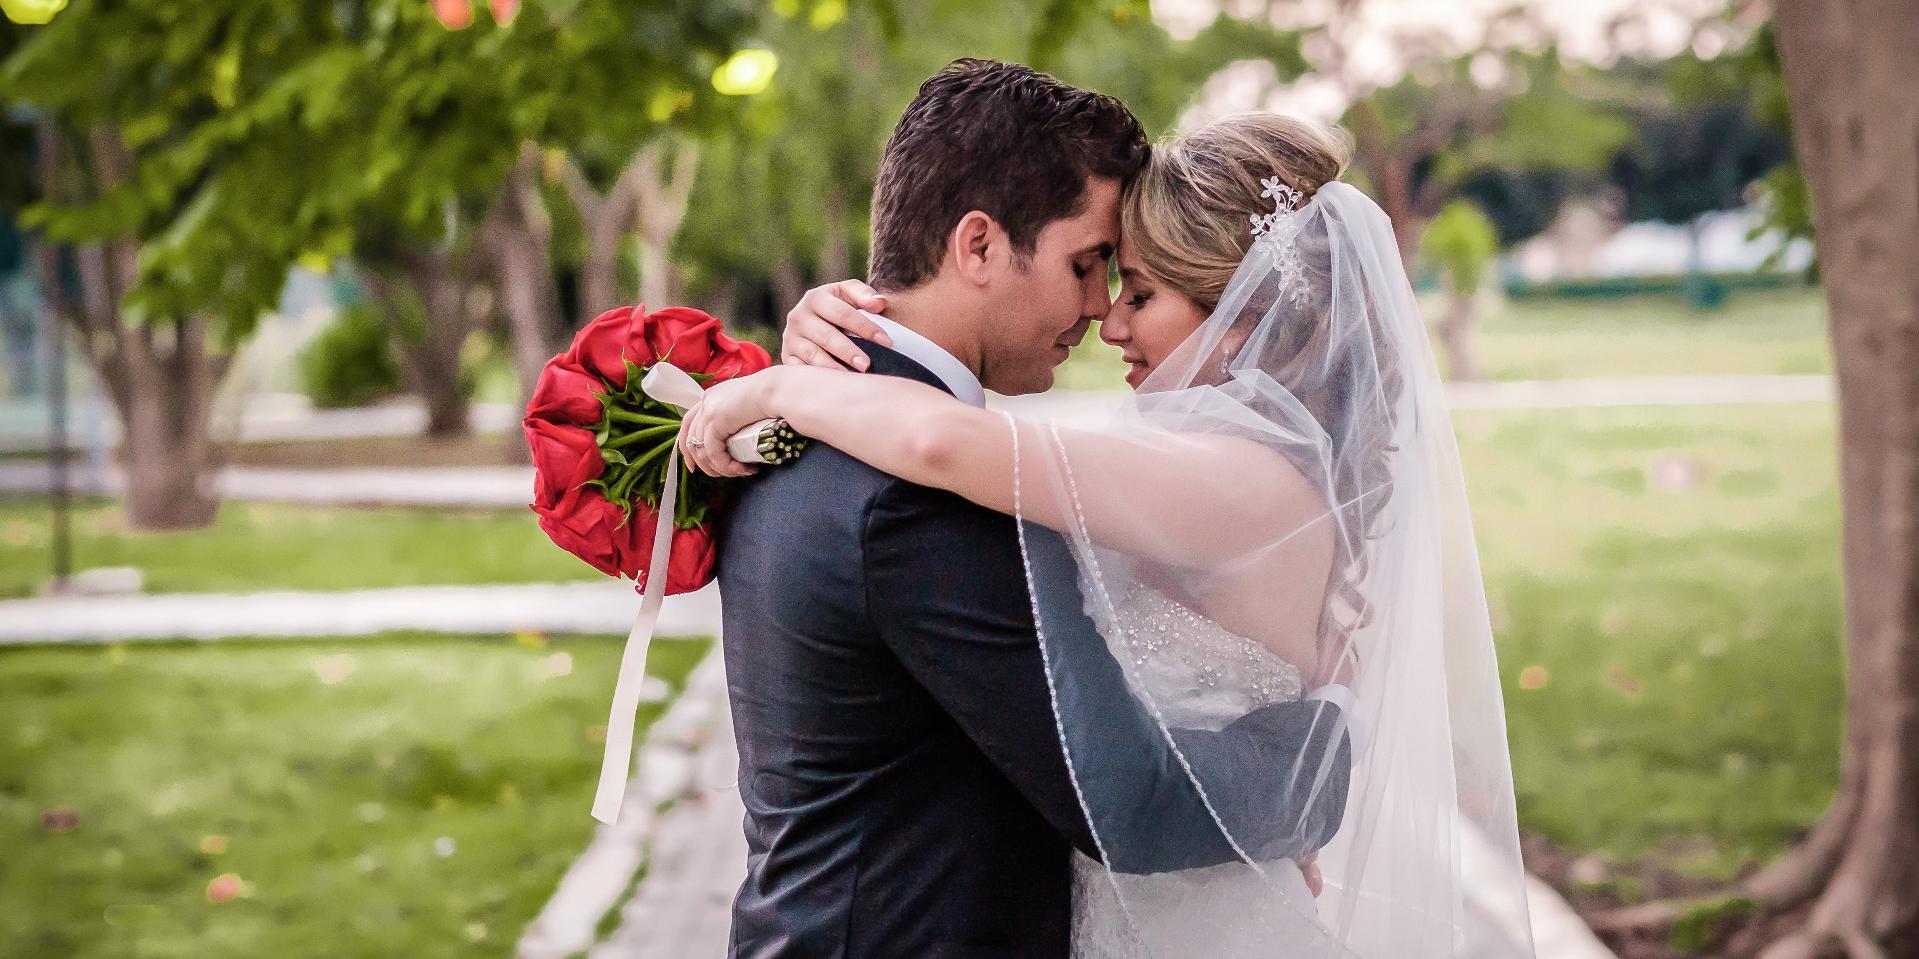 bodas-sin-clasificar-sin-tema-cuba-28281.jpg